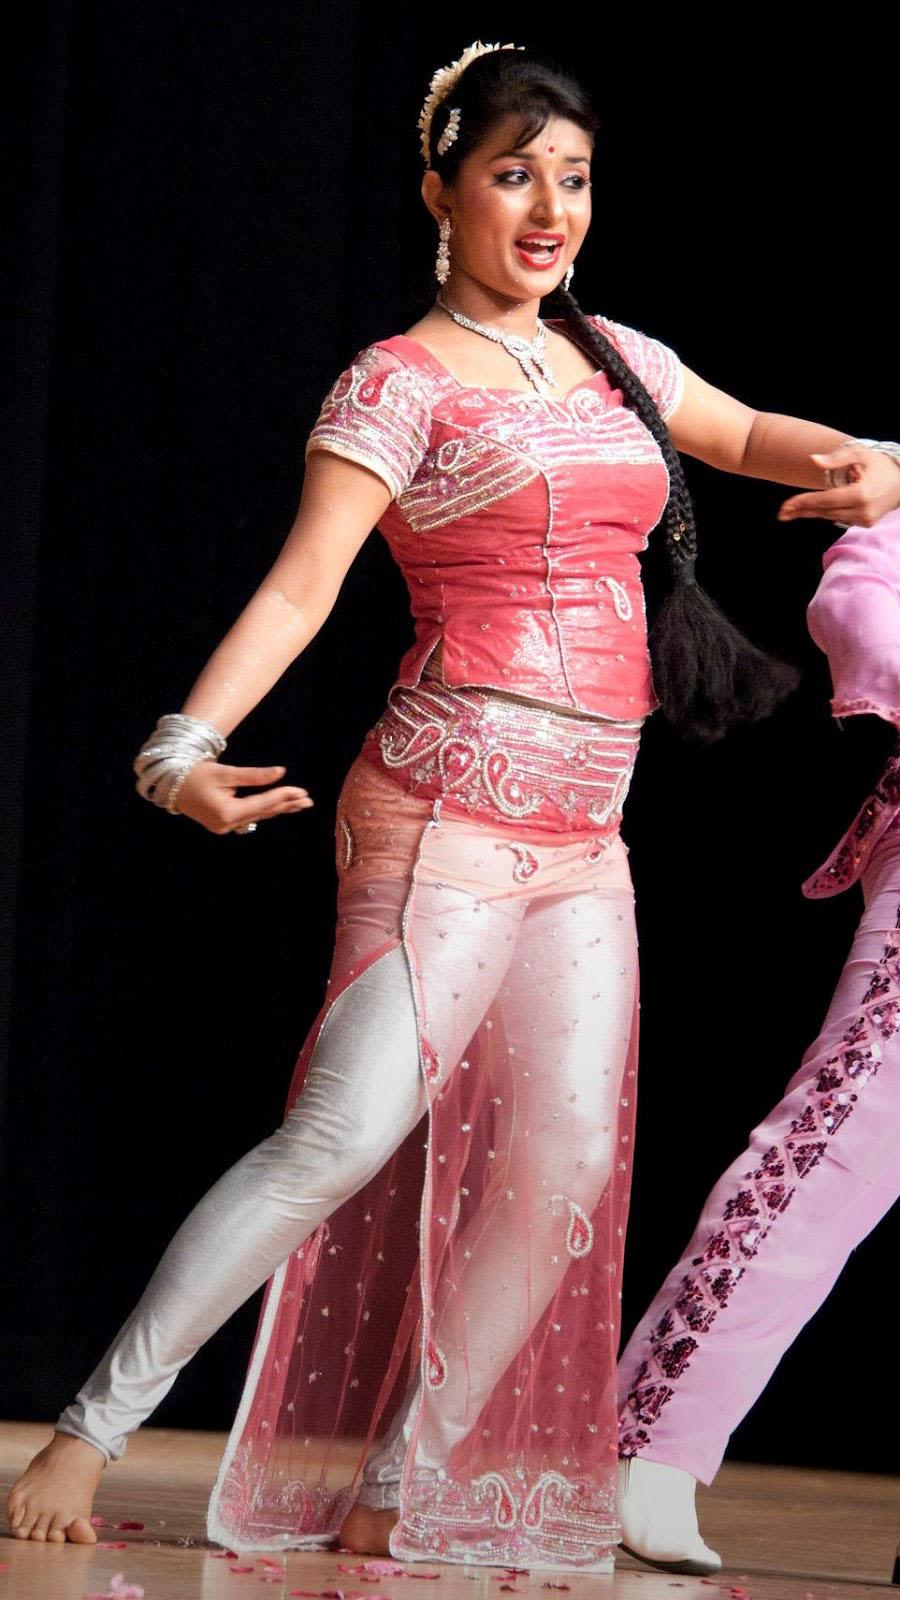 from Keagan tamil actress nude dancing